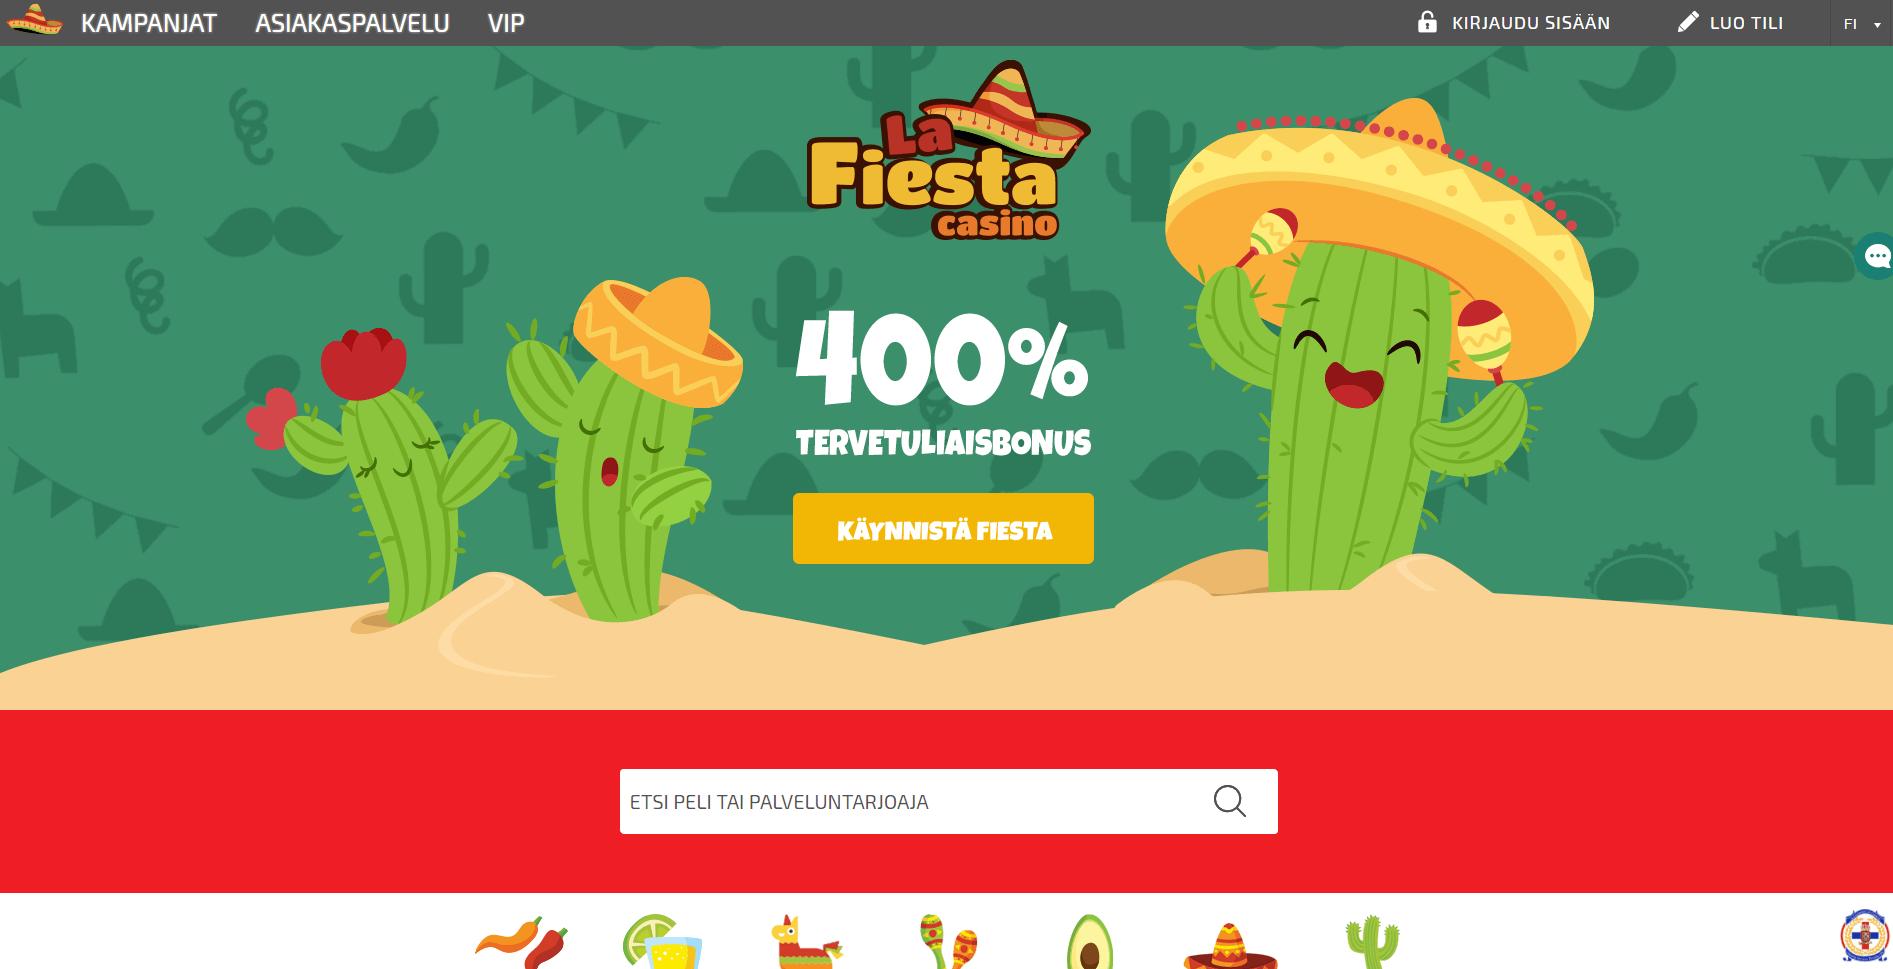 La Fiesta Casinon kampanjat